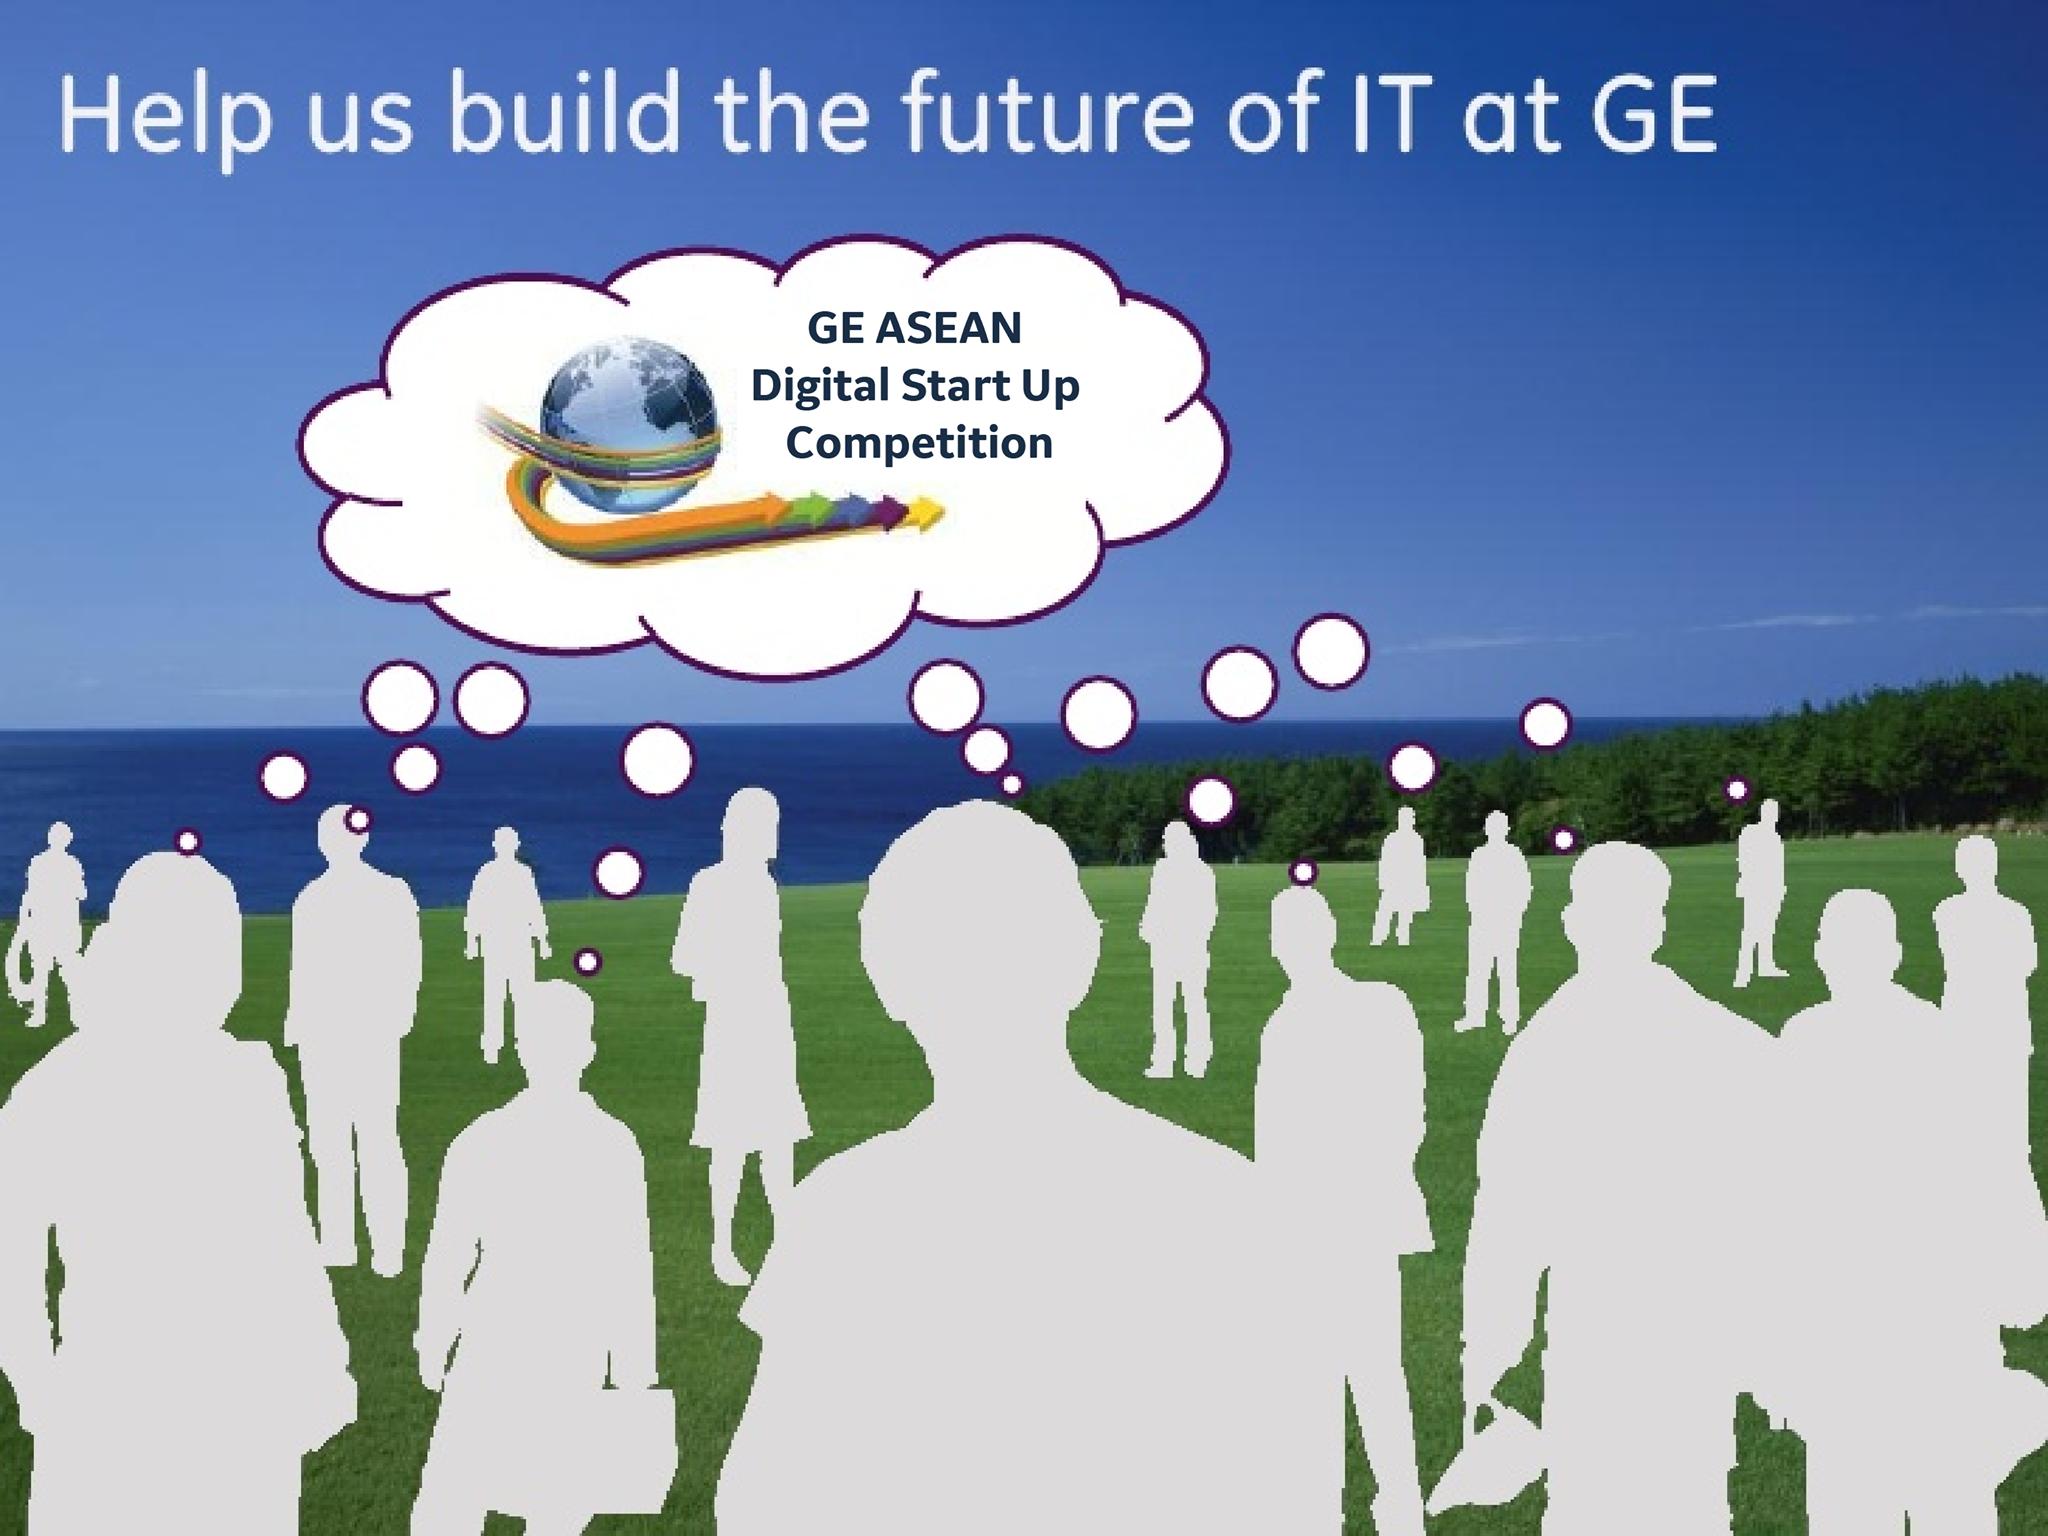 GE kicks off ASEAN Digital Start Up Competition 2017